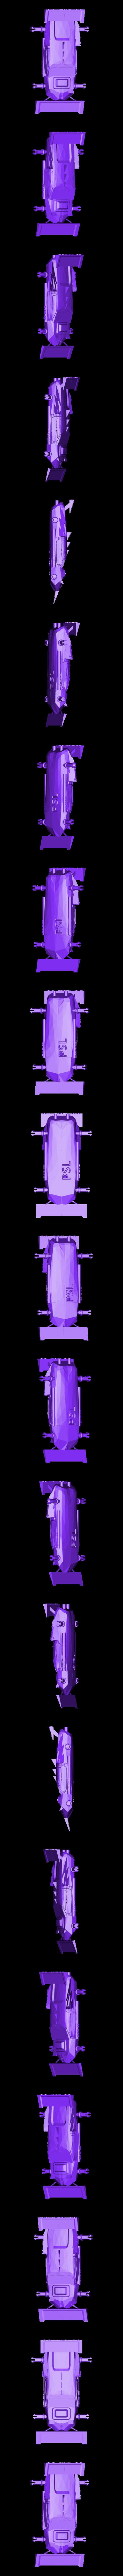 caisse .stl Download free STL file Concept car EVO II M • 3D printer template, psl